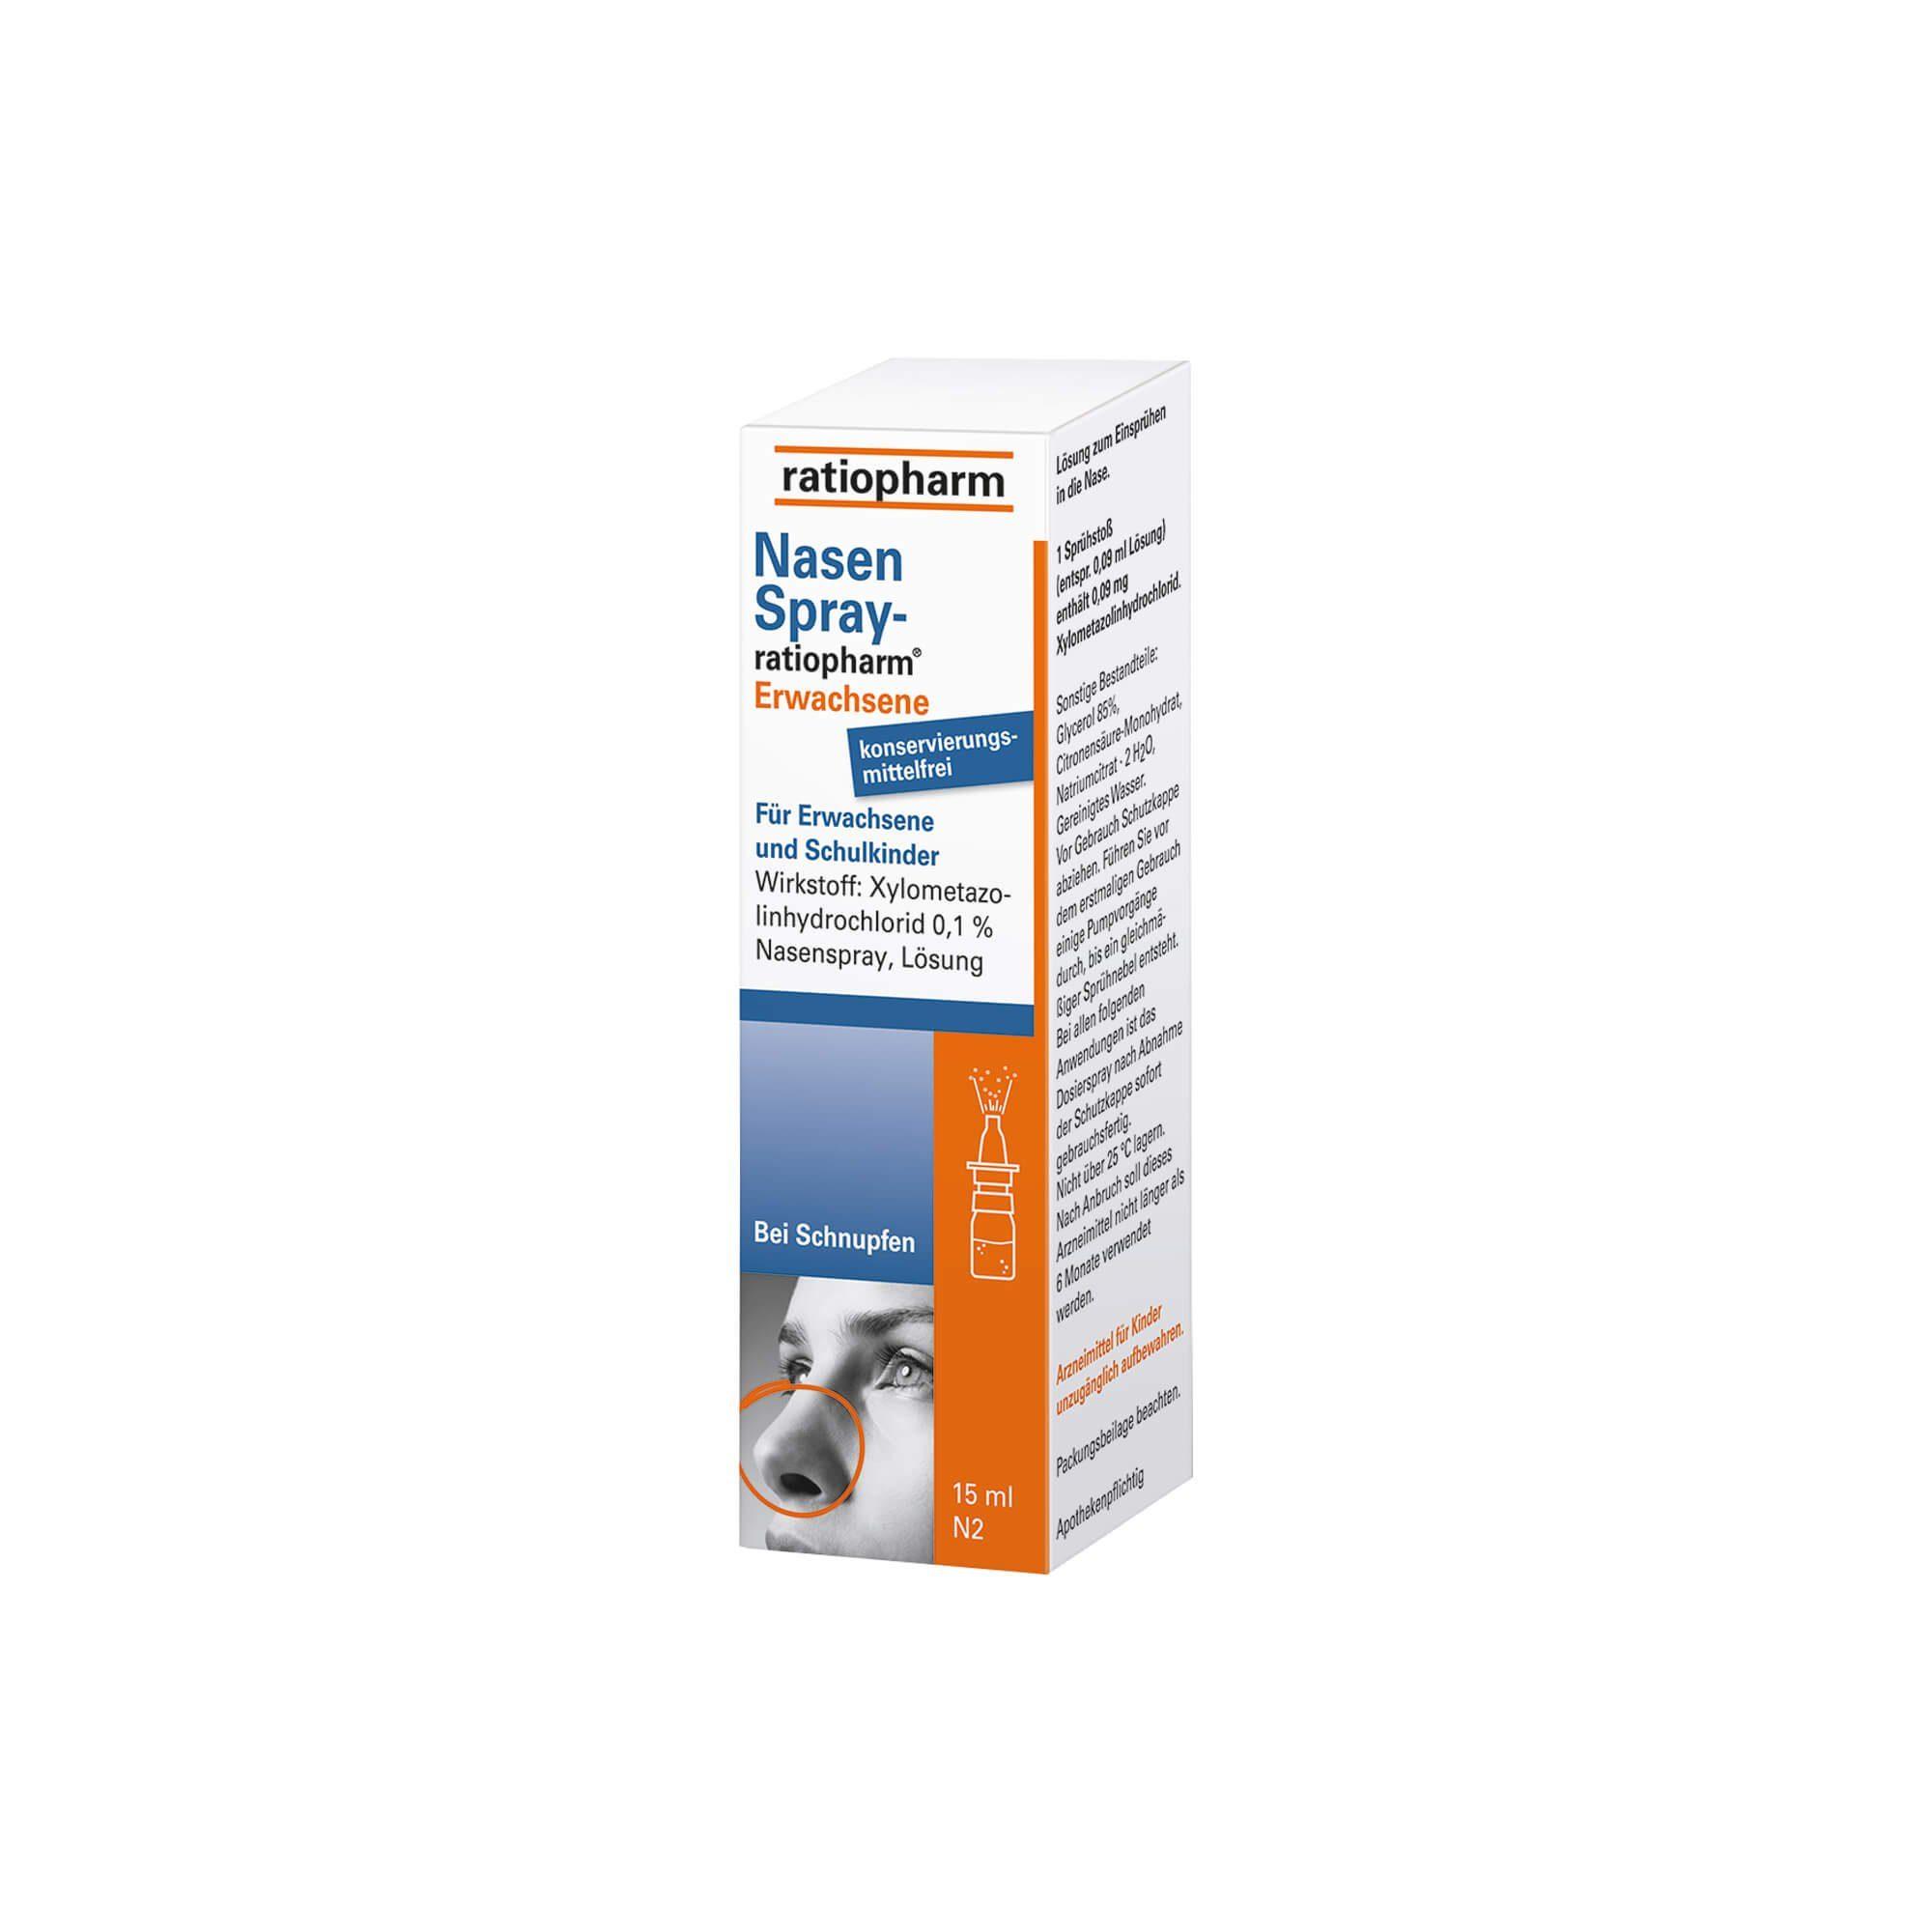 Nasenspray-ratiopharm für Erwachsene, 15 ml